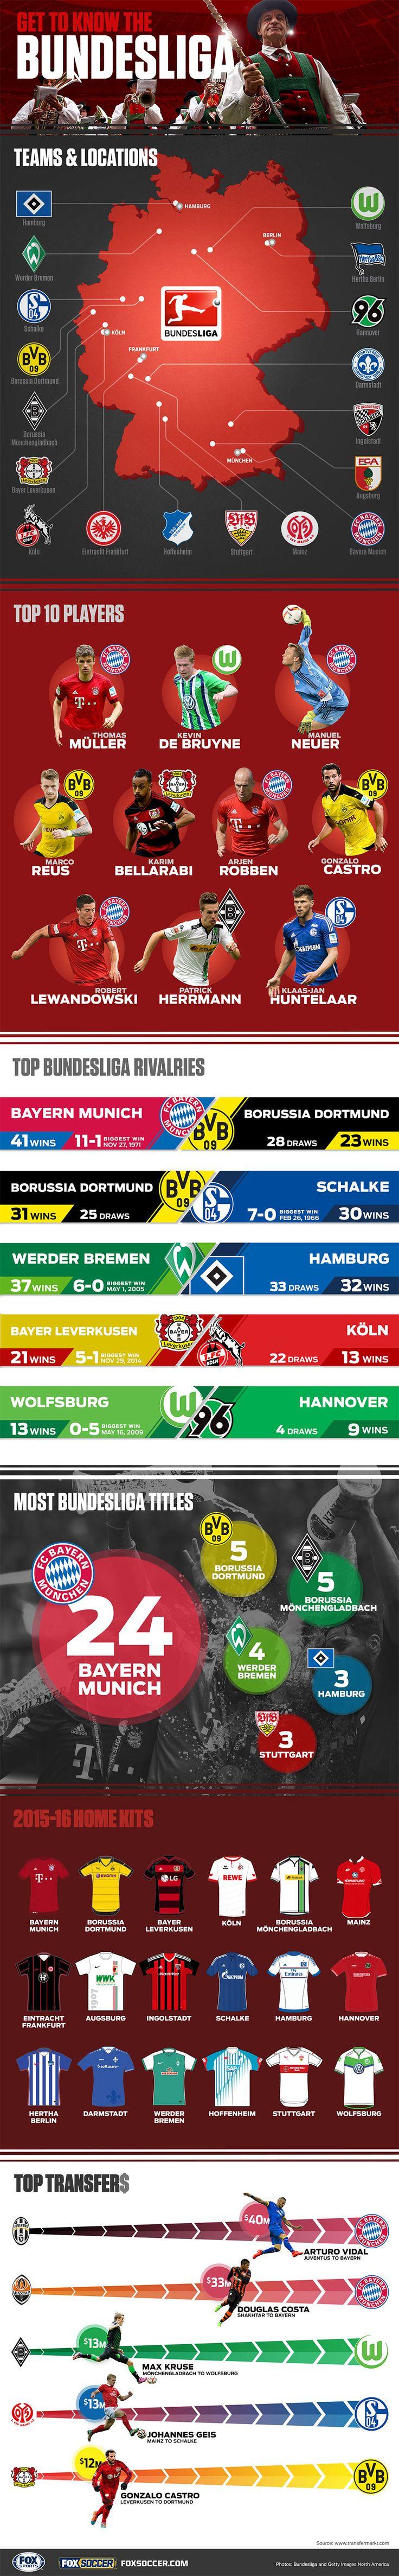 Get to know the Bundesliga on FOX   FOX Sports